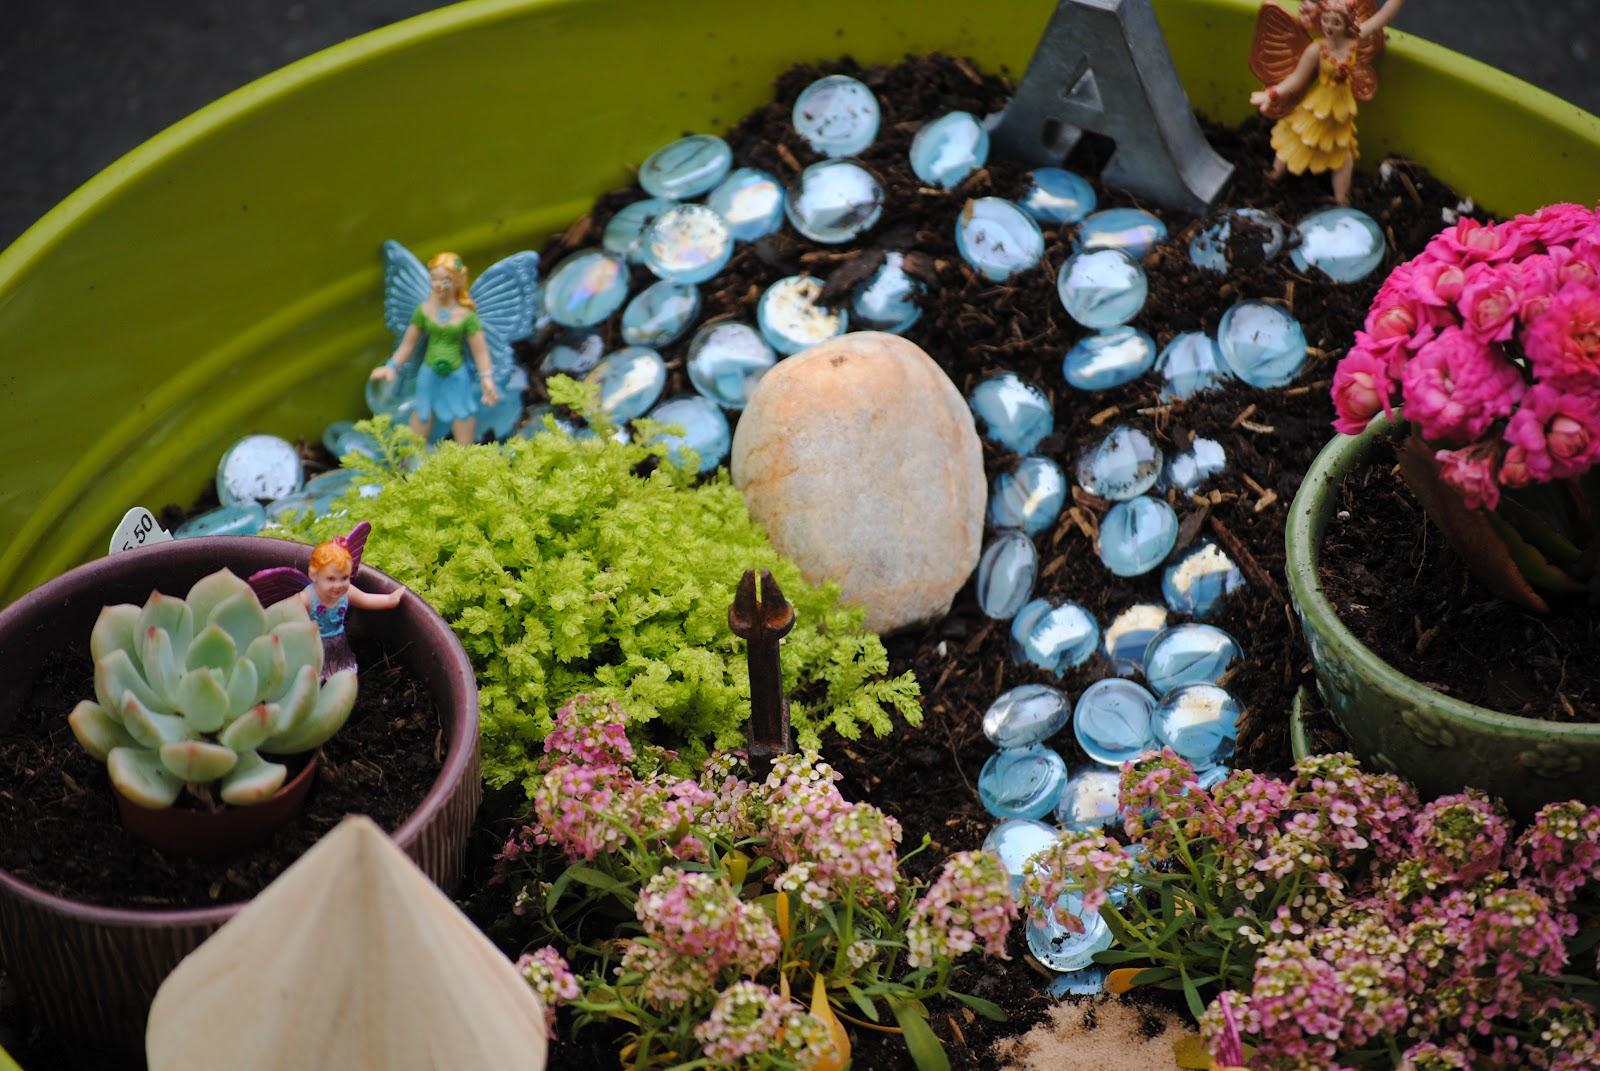 How Does Your Fairy Garden Grow Making Lemonade